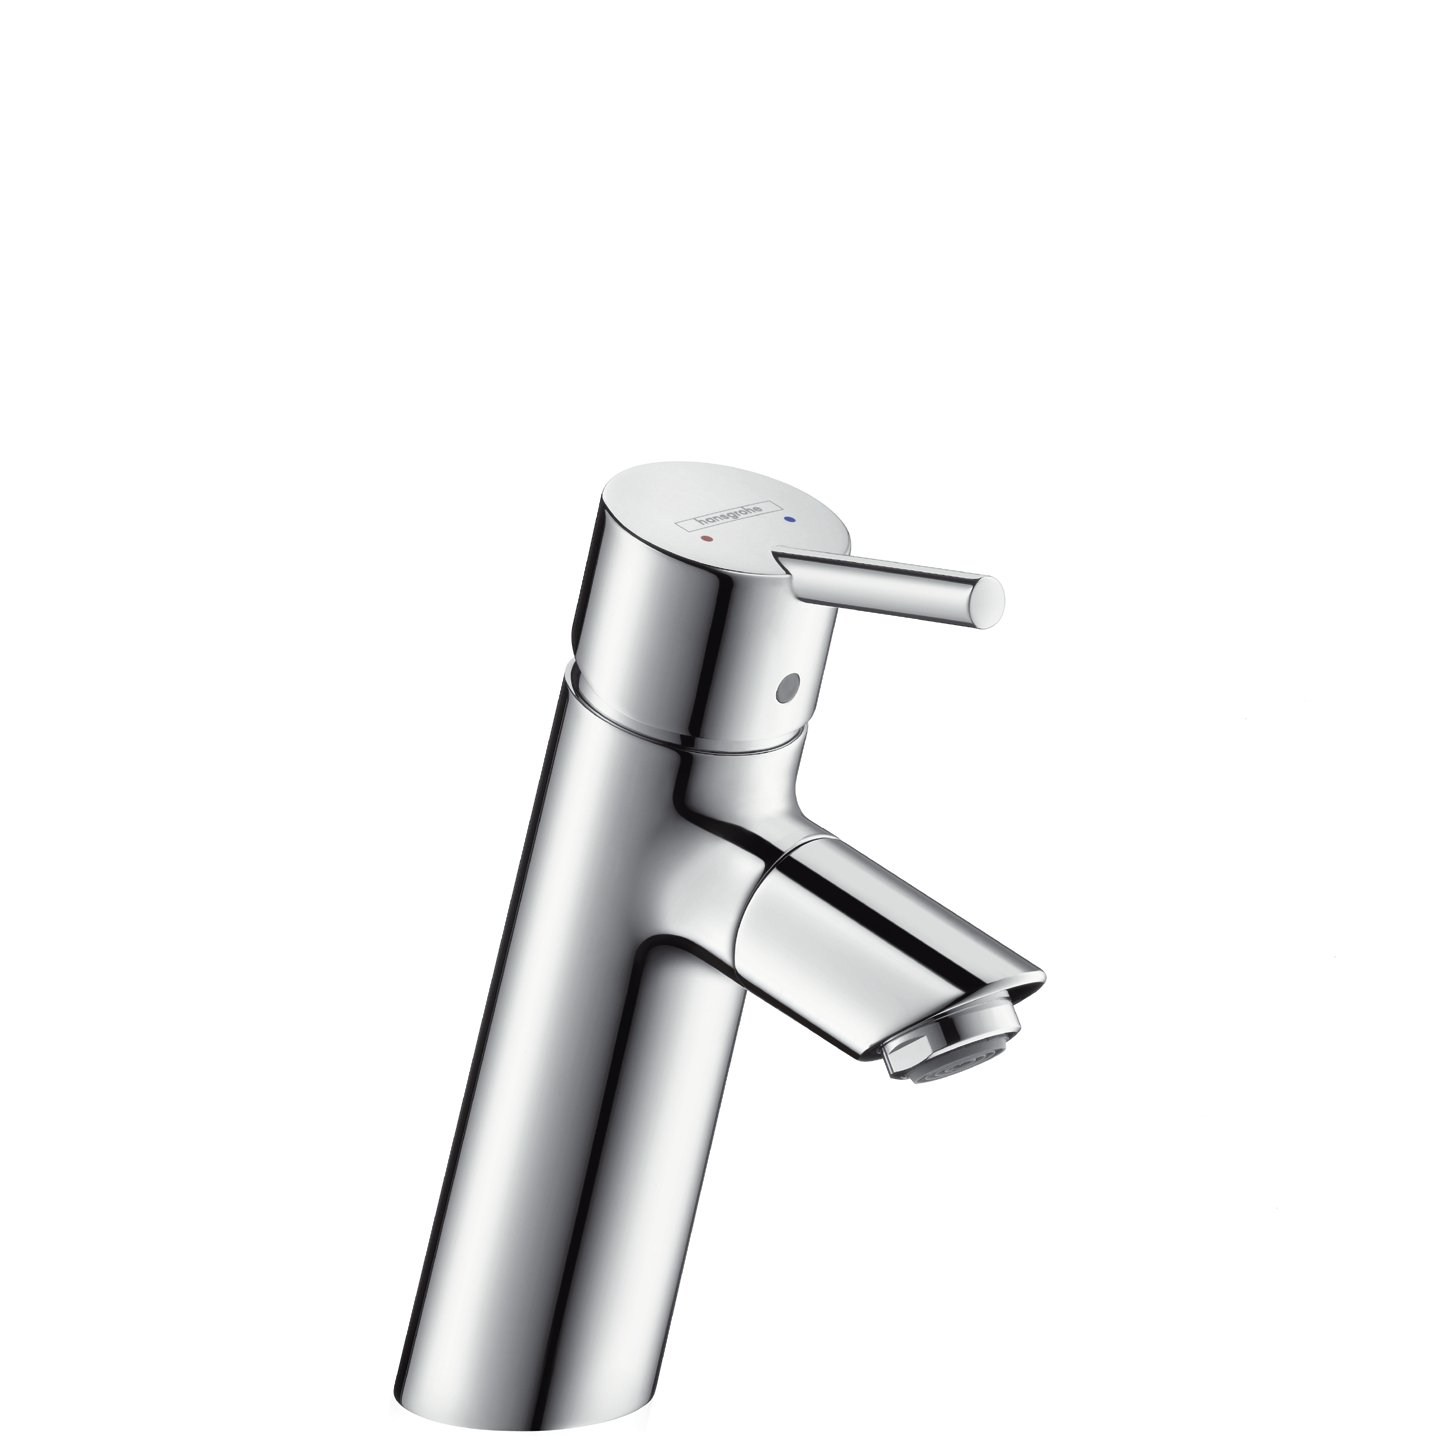 Gut Hansgrohe 32053000 Talis 80 Chrome Basin Mixer Tap - - Amazon.com VS67